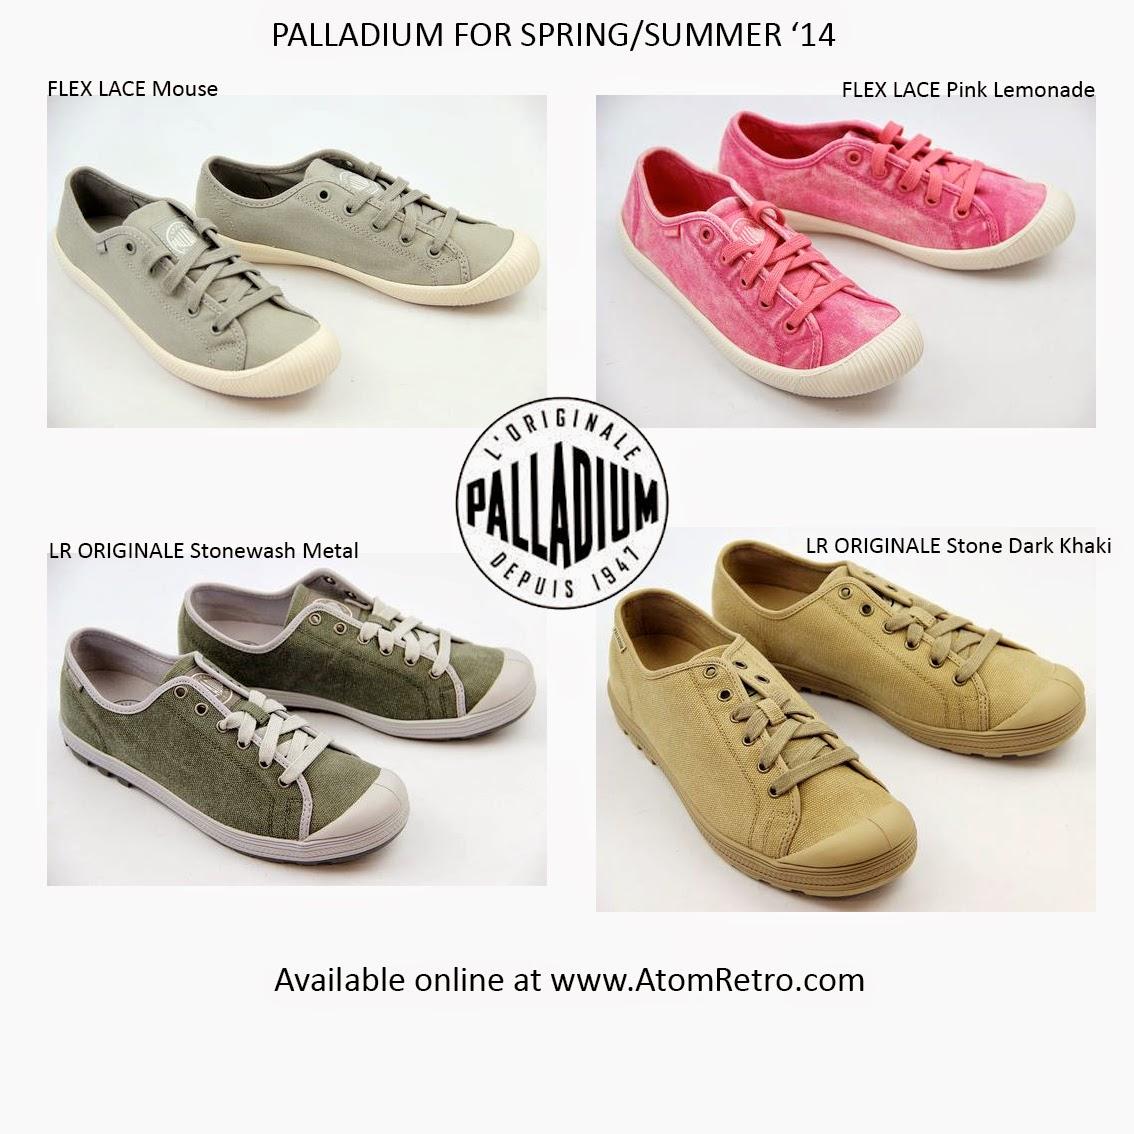 Palladium Mens and Womens Footwear online at Atom Retro